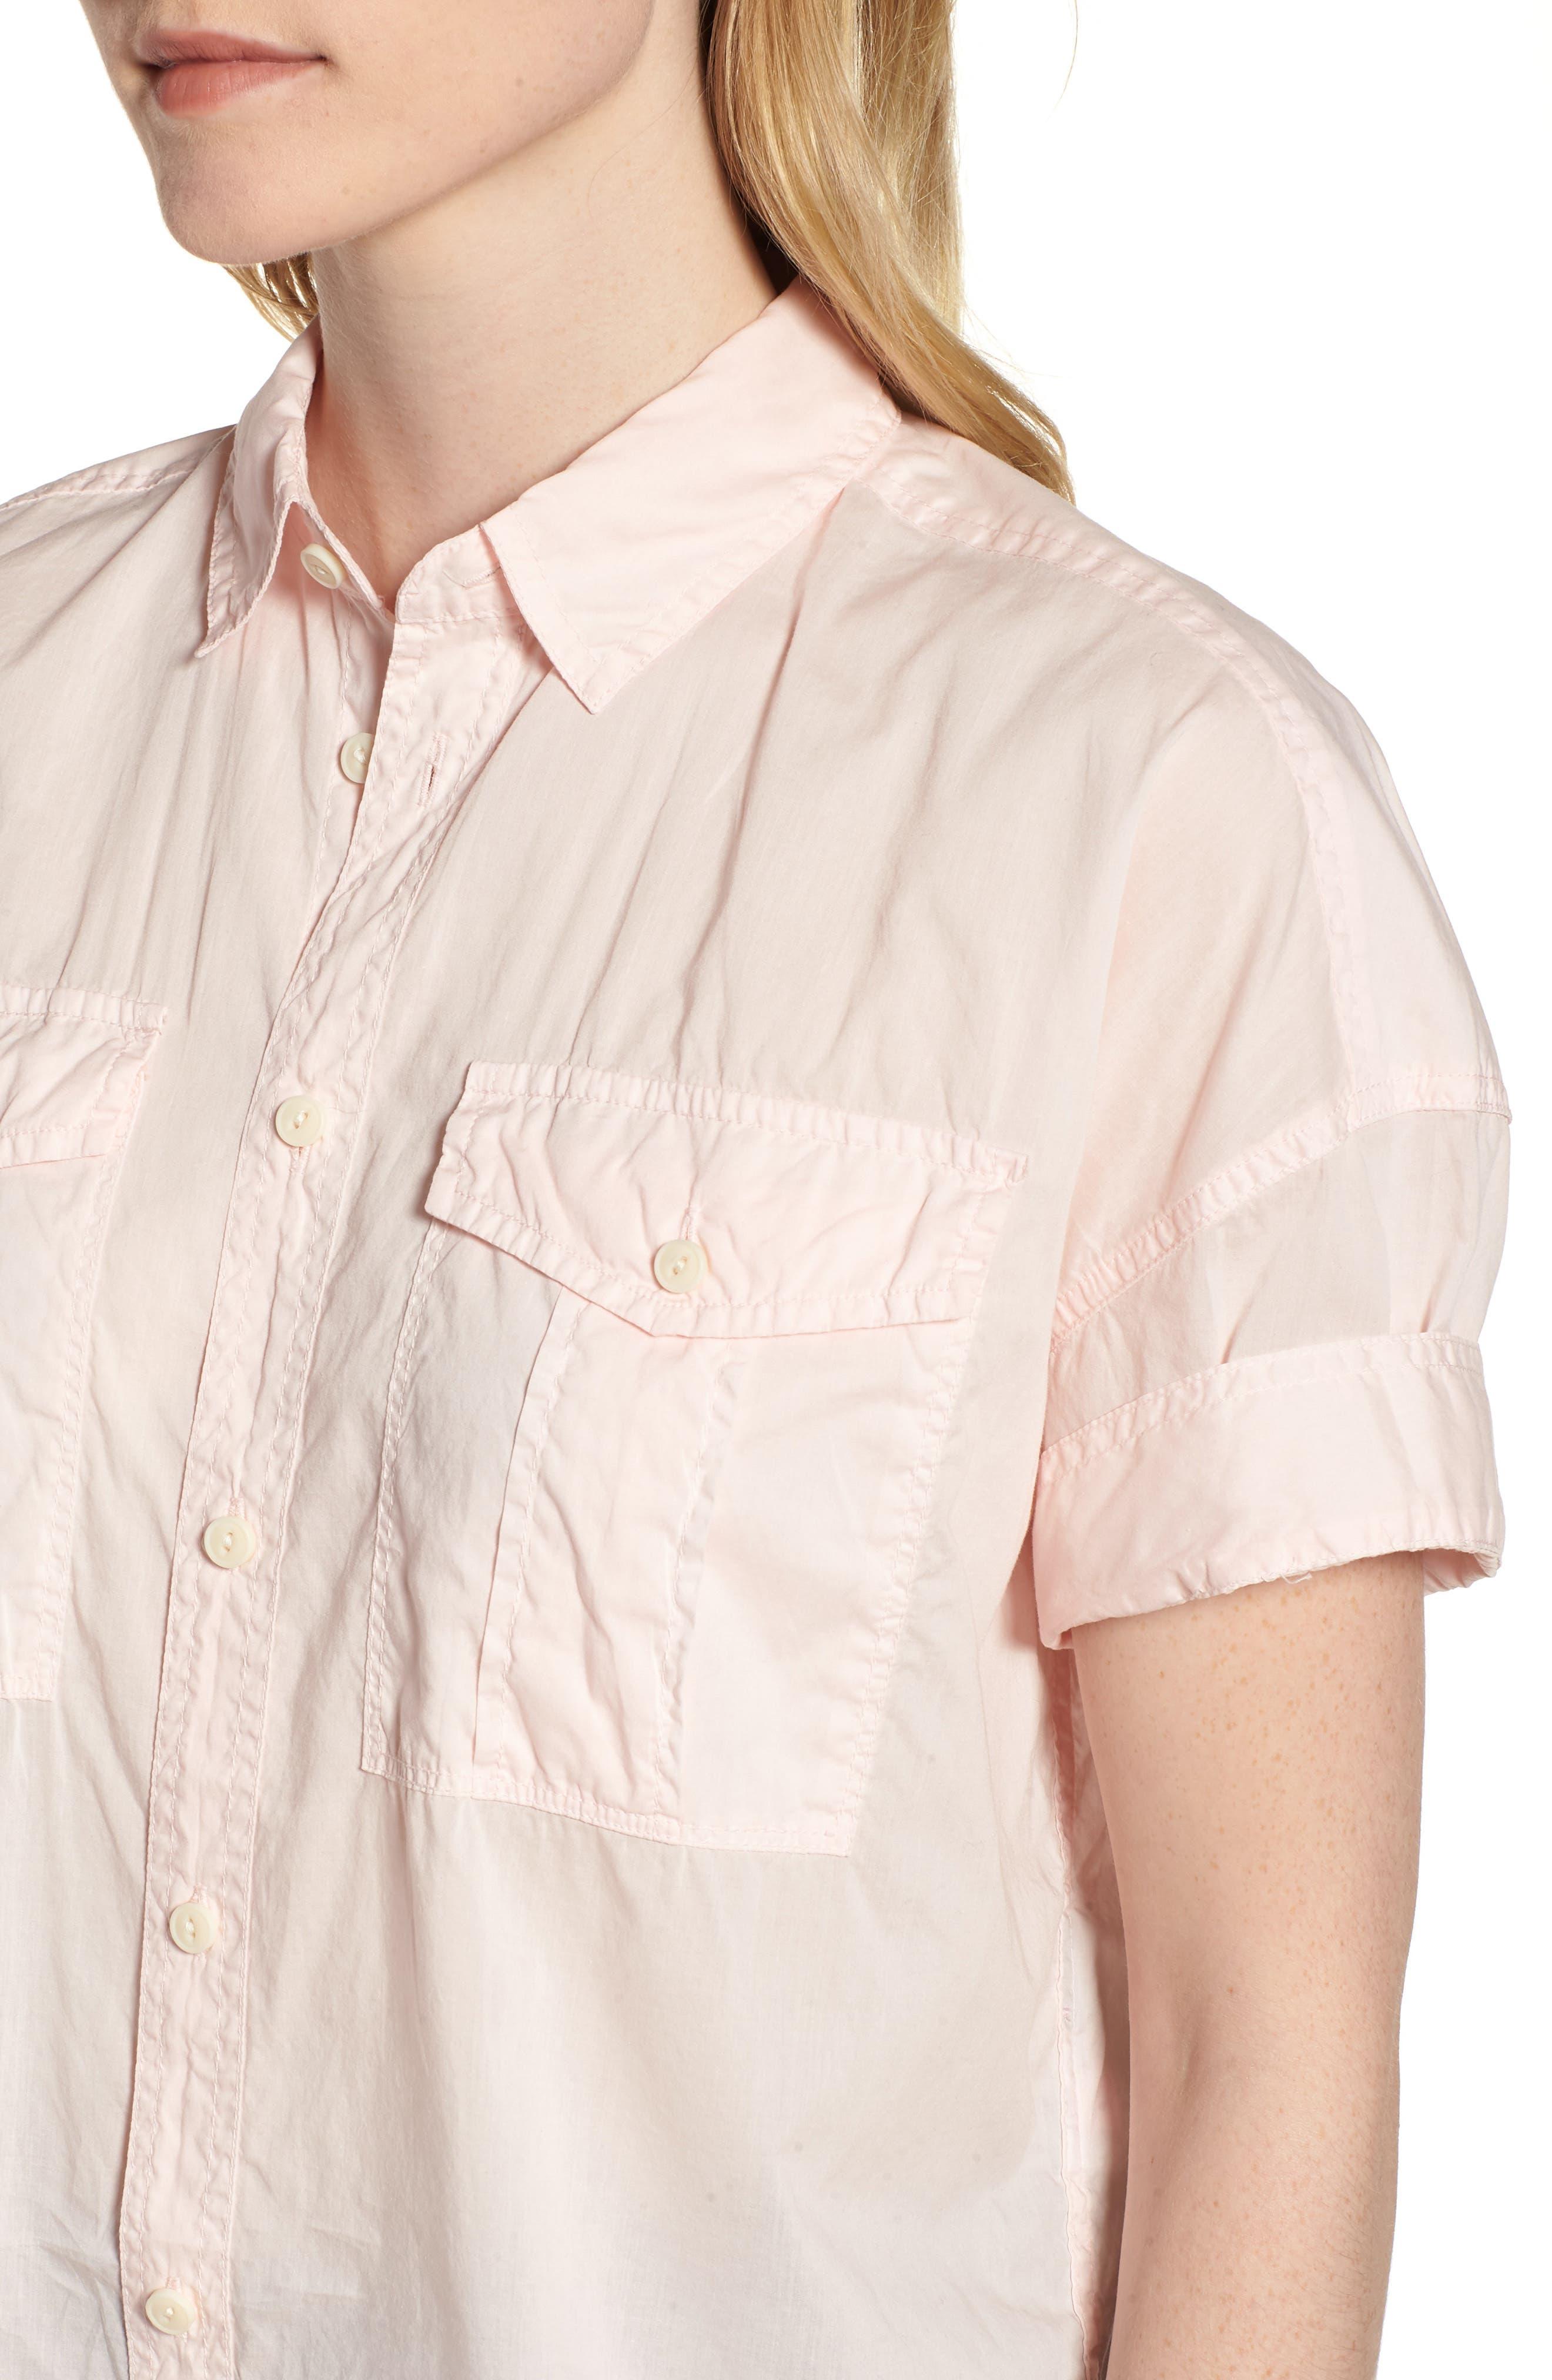 J.Crew Utility Pocket Shirt,                             Alternate thumbnail 7, color,                             Pastel Pink